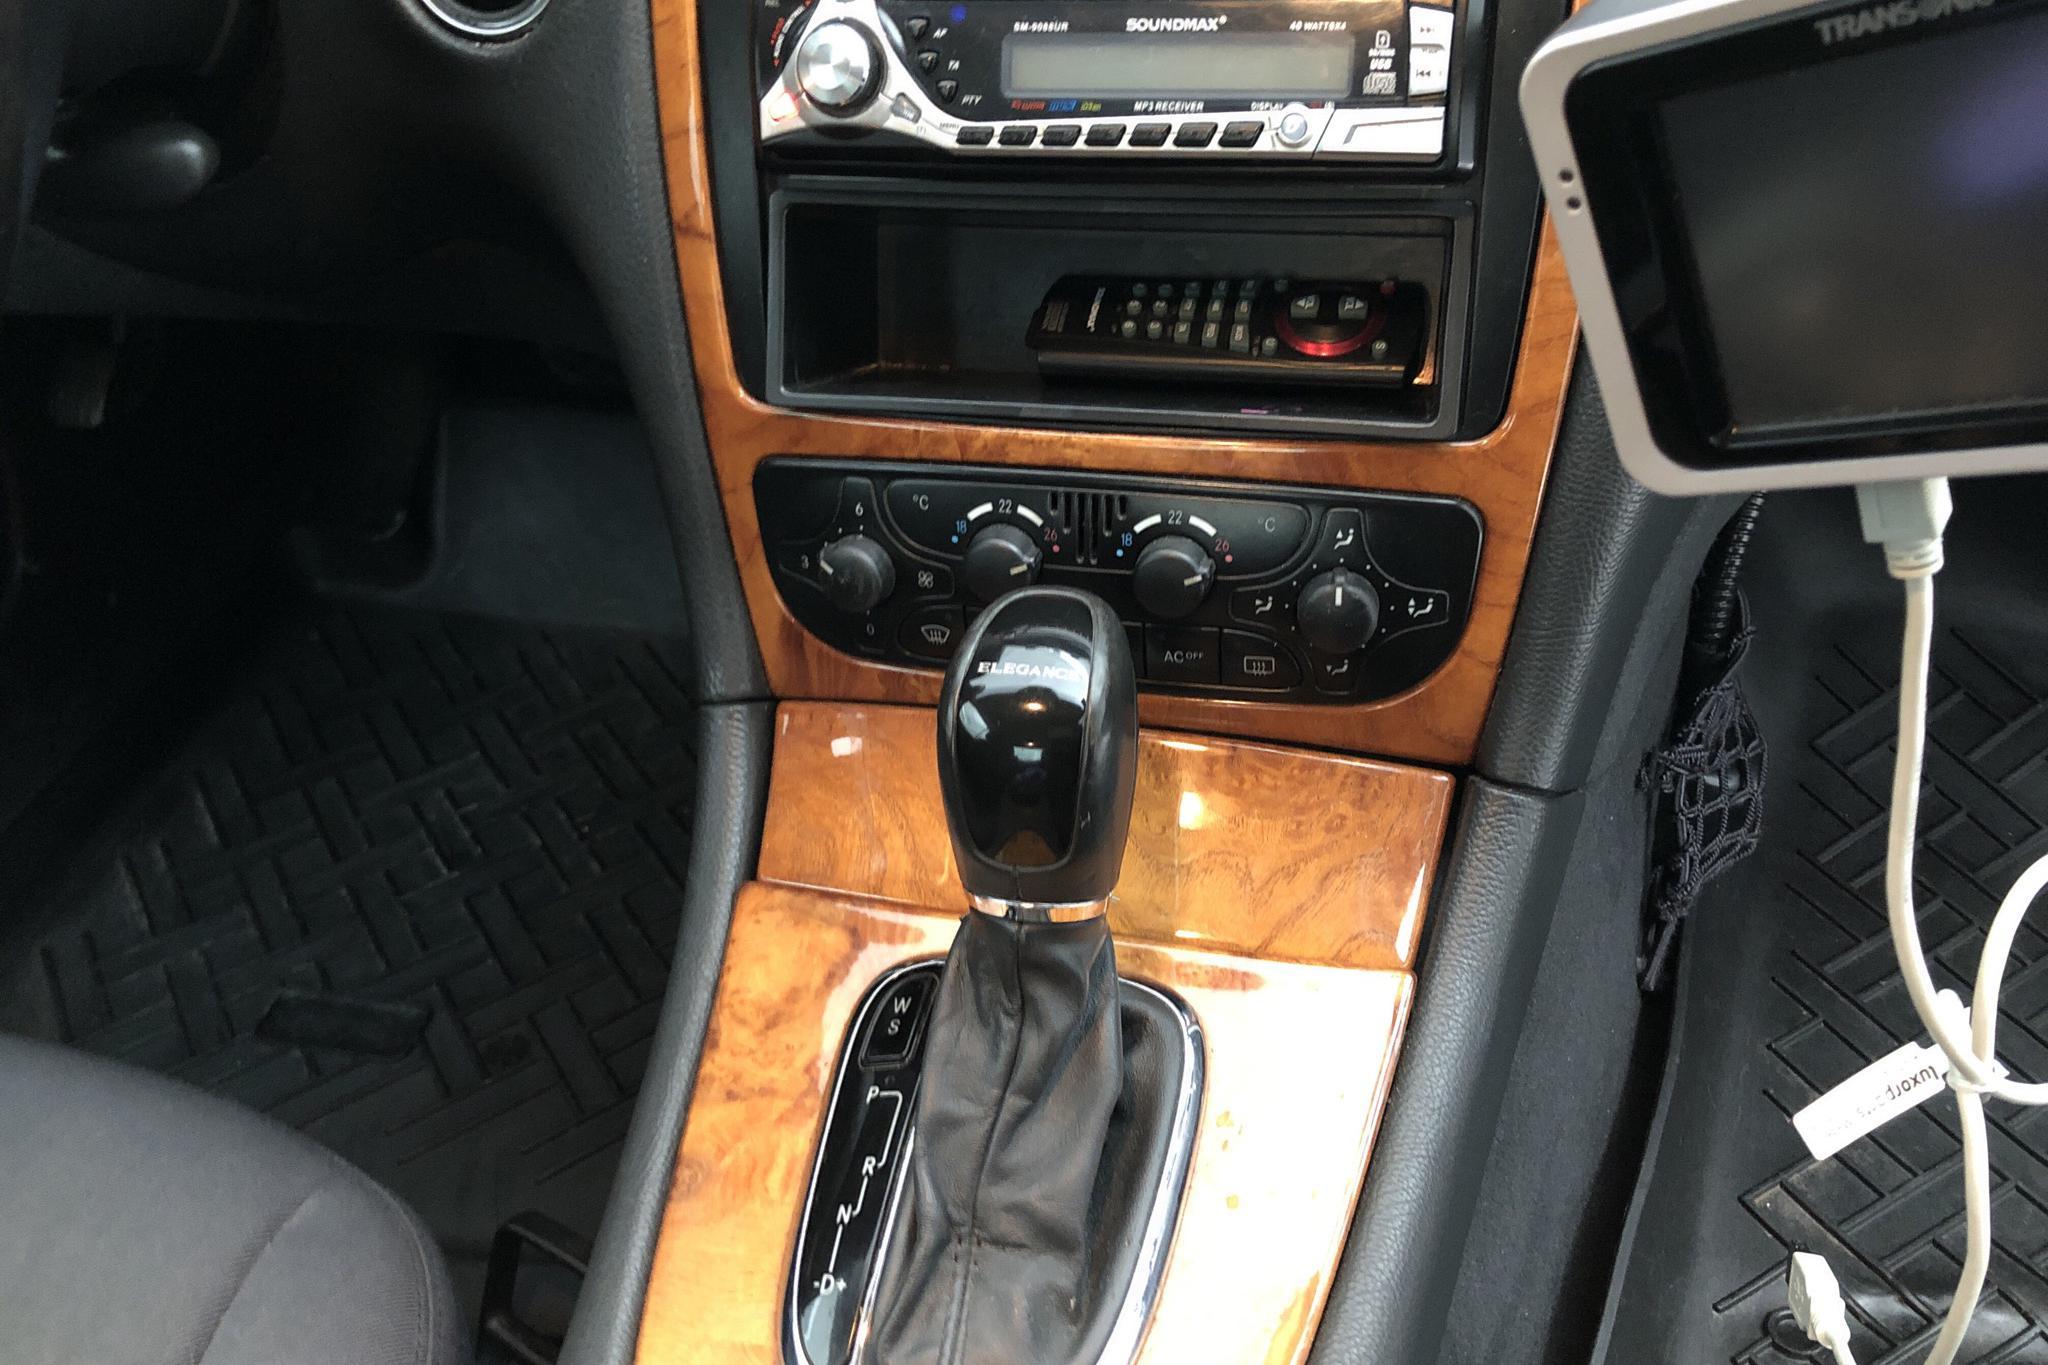 Mercedes CLK 270 CDI C209 (170hk) - 189 910 km - Automatic - silver - 2003